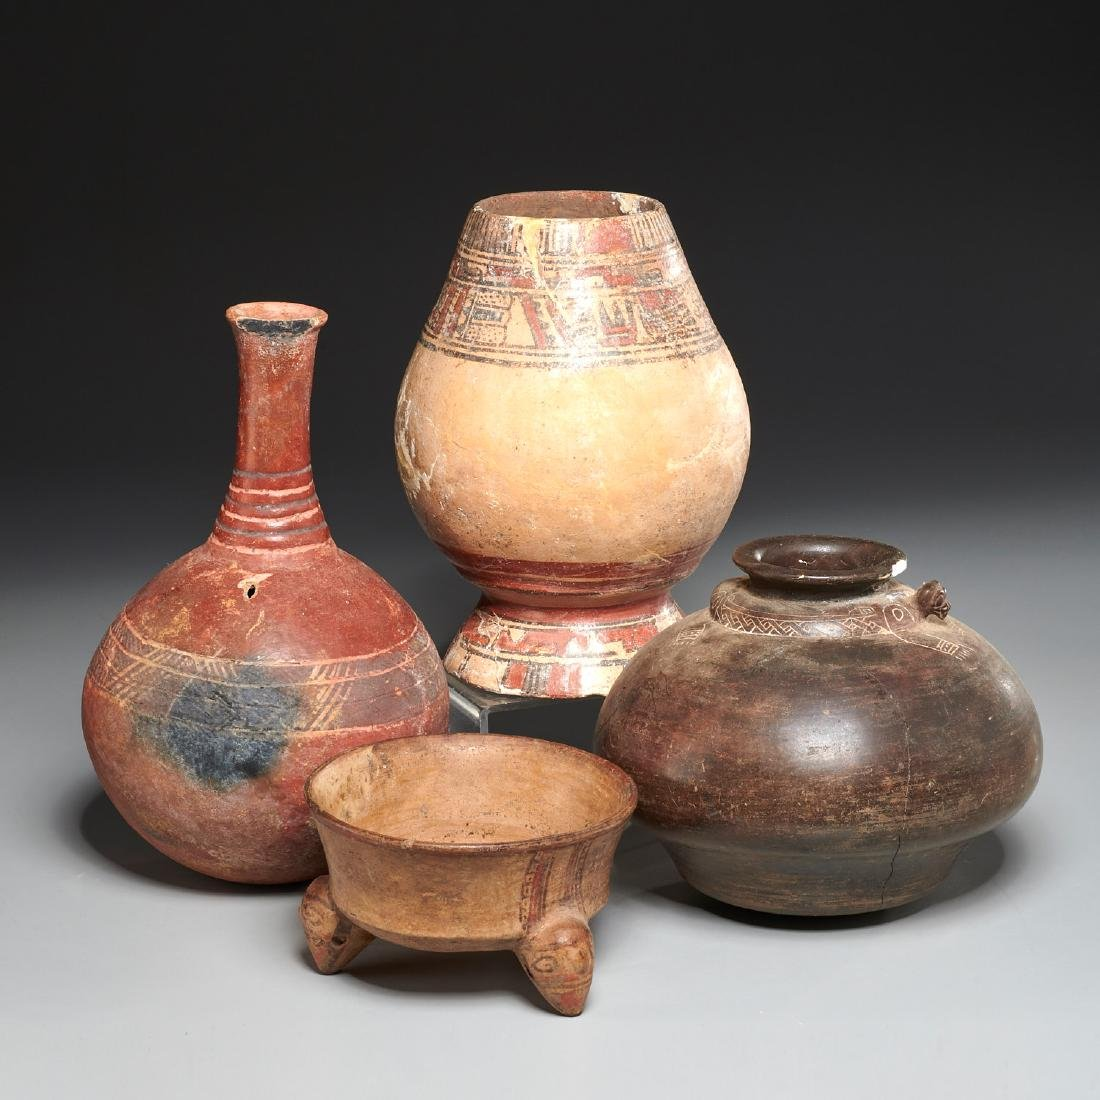 Group (4) Pre-Columbian terracotta vessels